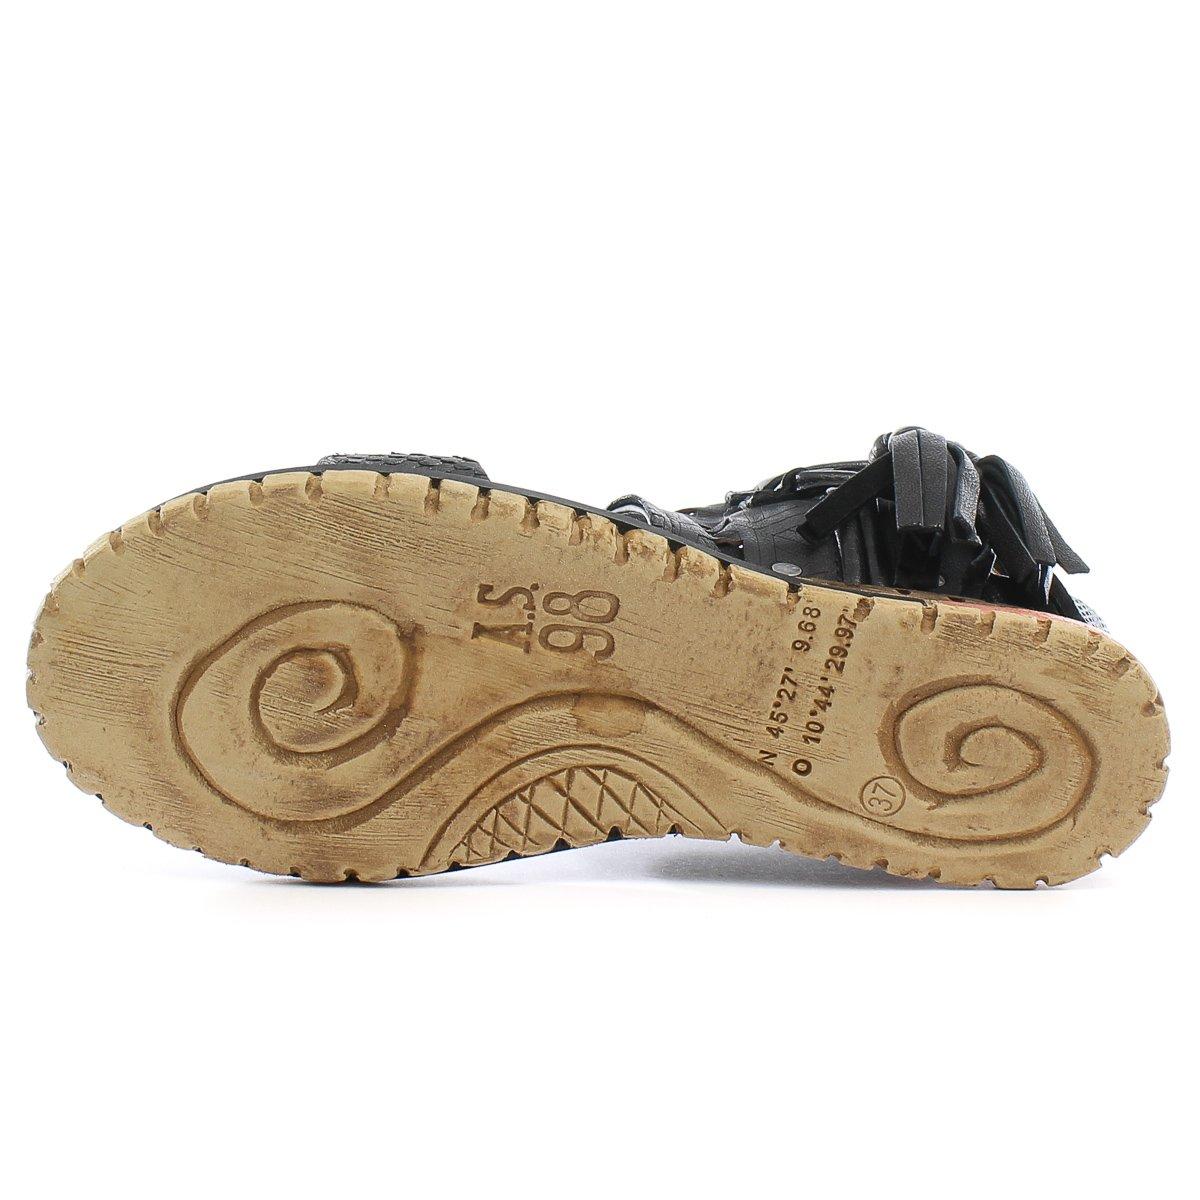 A.S.98 Petrona Women's Wedge Sandal B01N7T450I 40 M EU|Nero